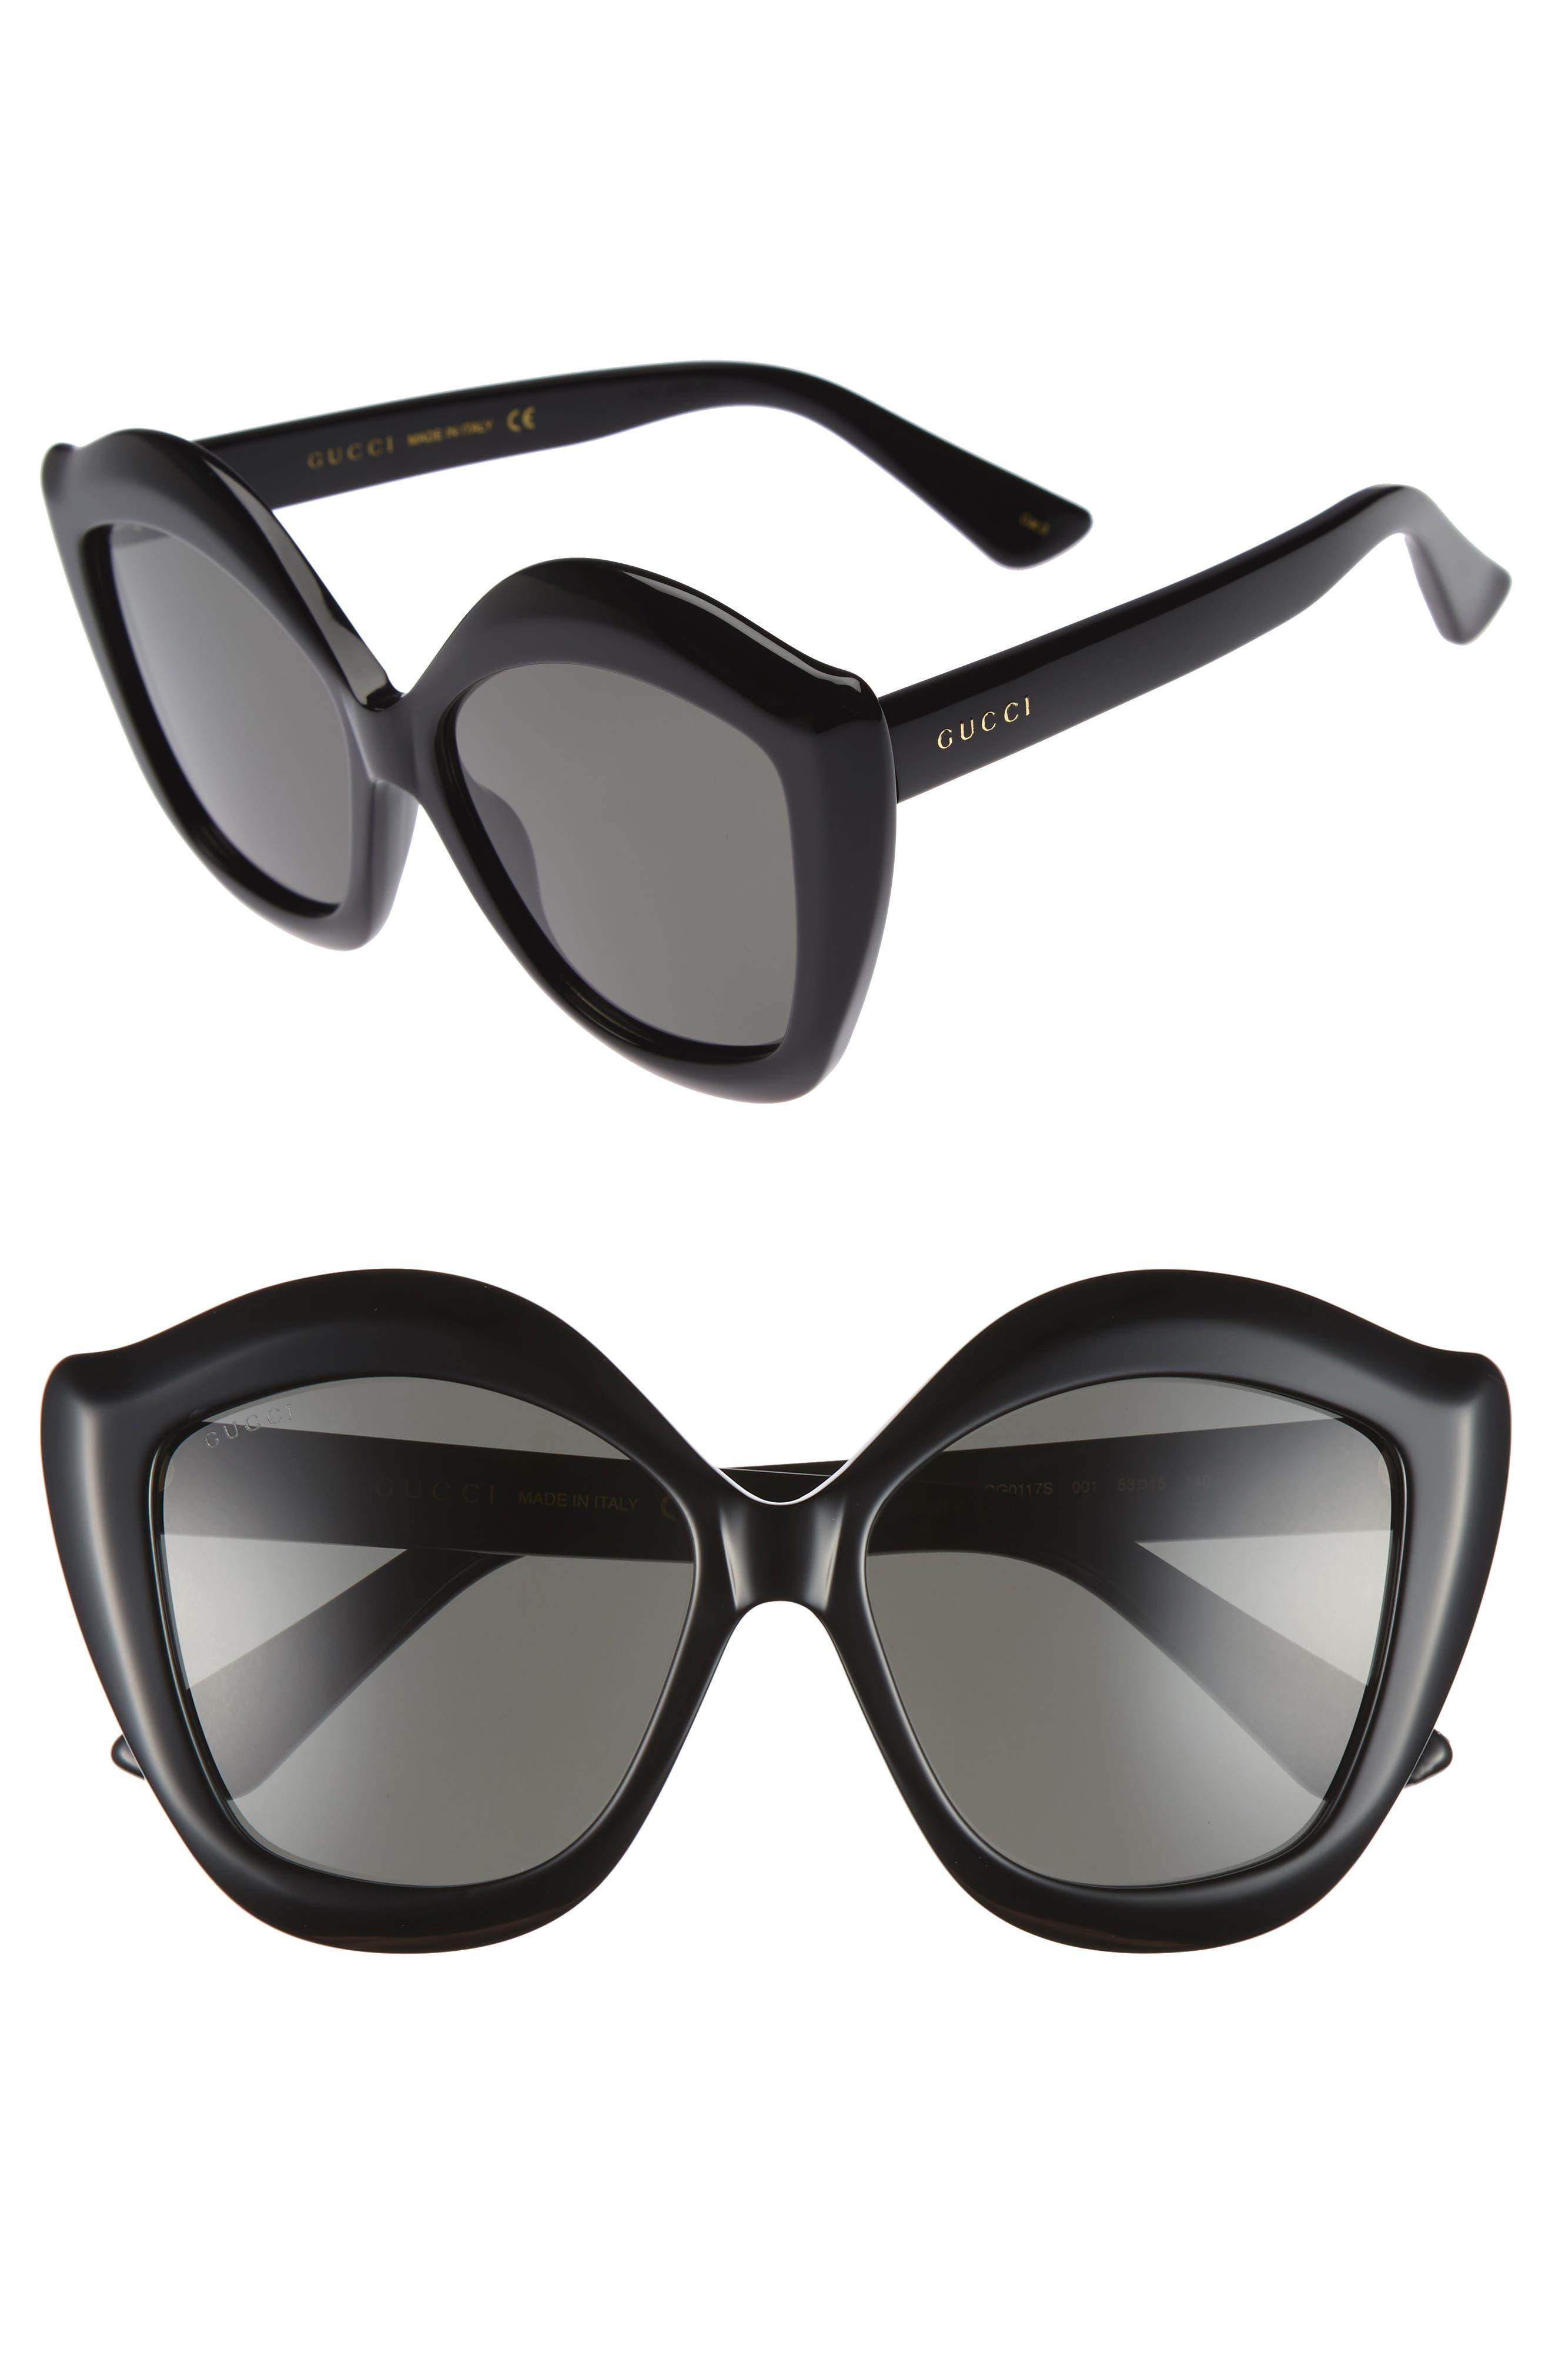 Main Image - Gucci 53mm Cat Eye Sunglasses